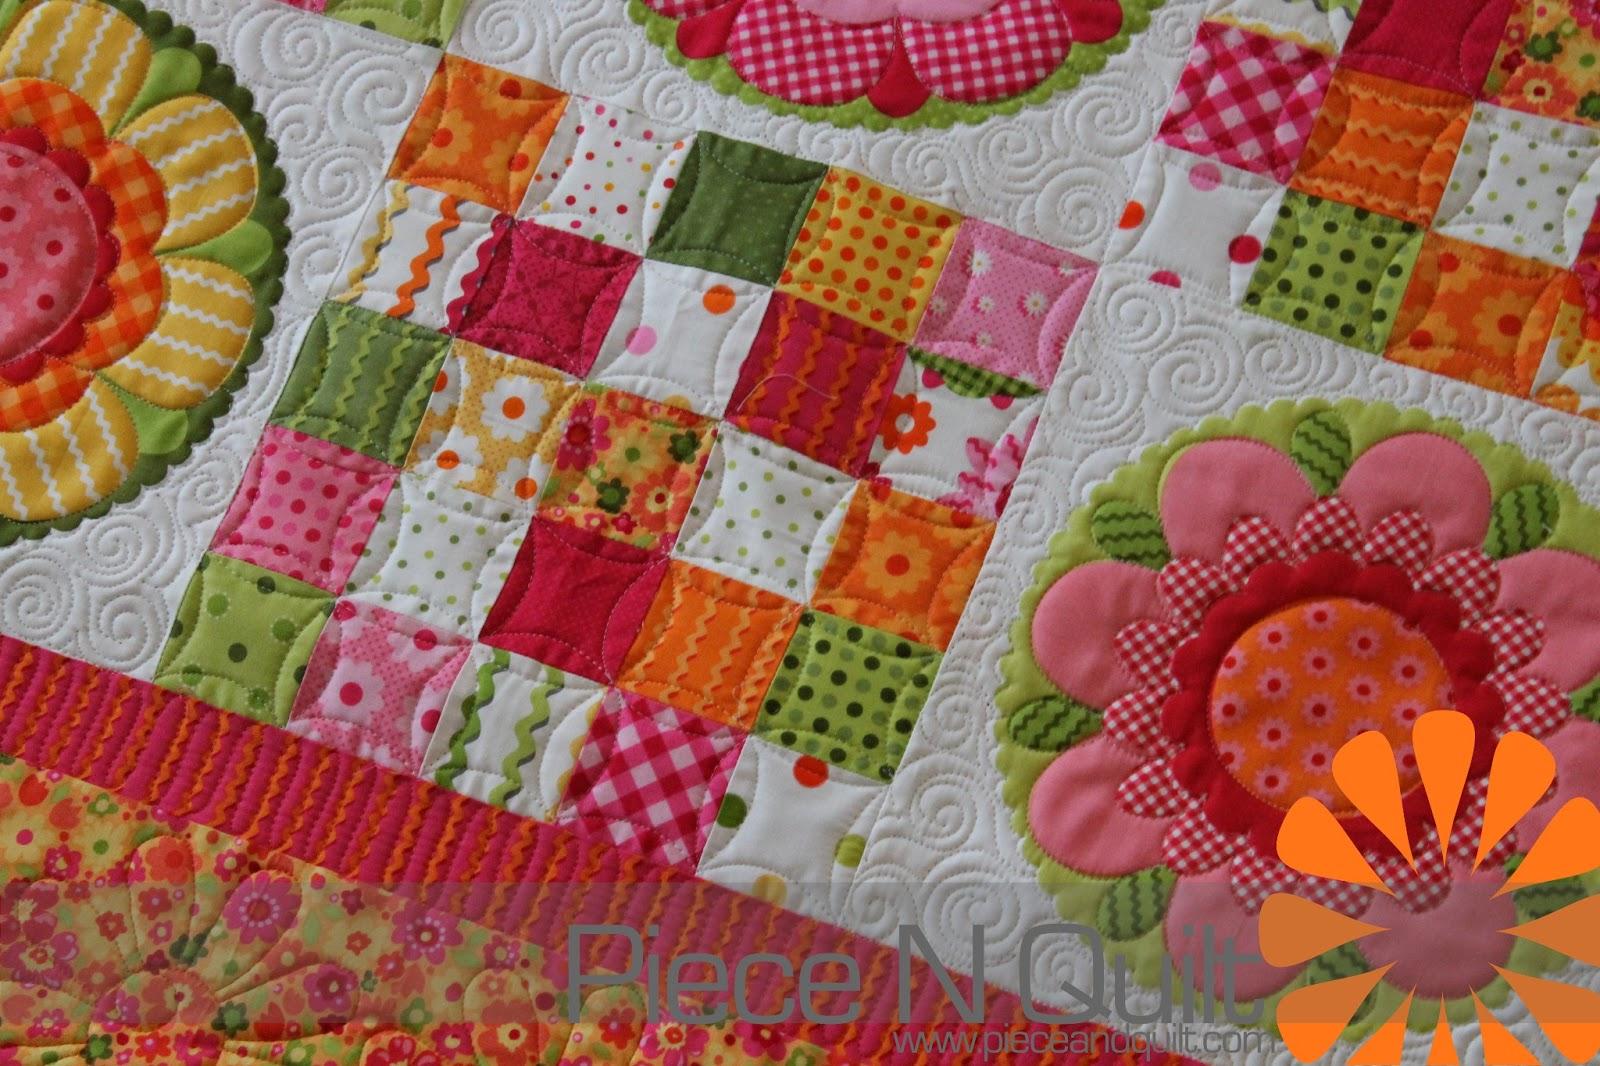 Piece N Quilt: Coordinating Little Girl Quilts